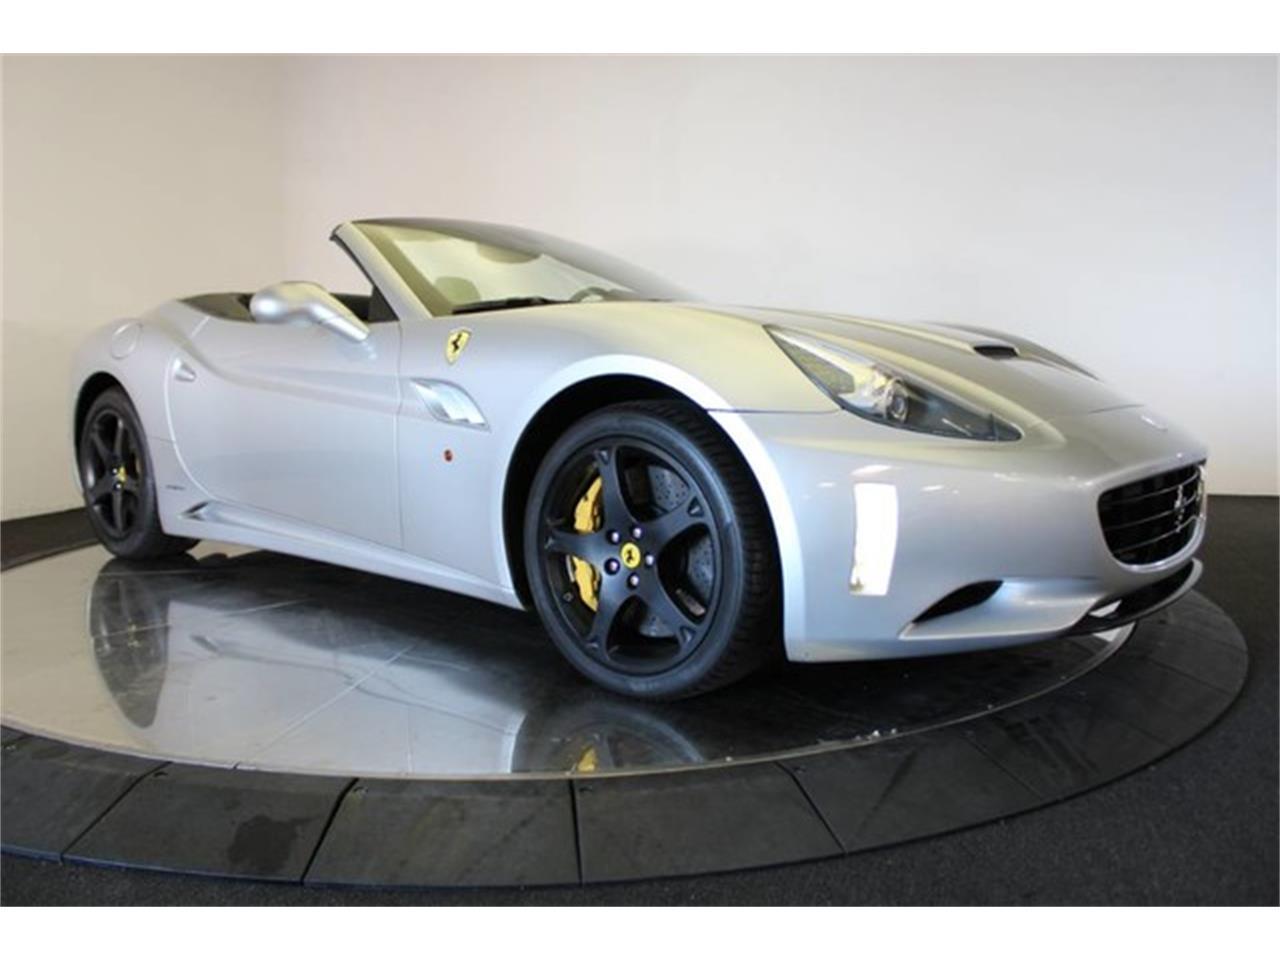 2009 Ferrari California (CC-1093825) for sale in Anaheim, California